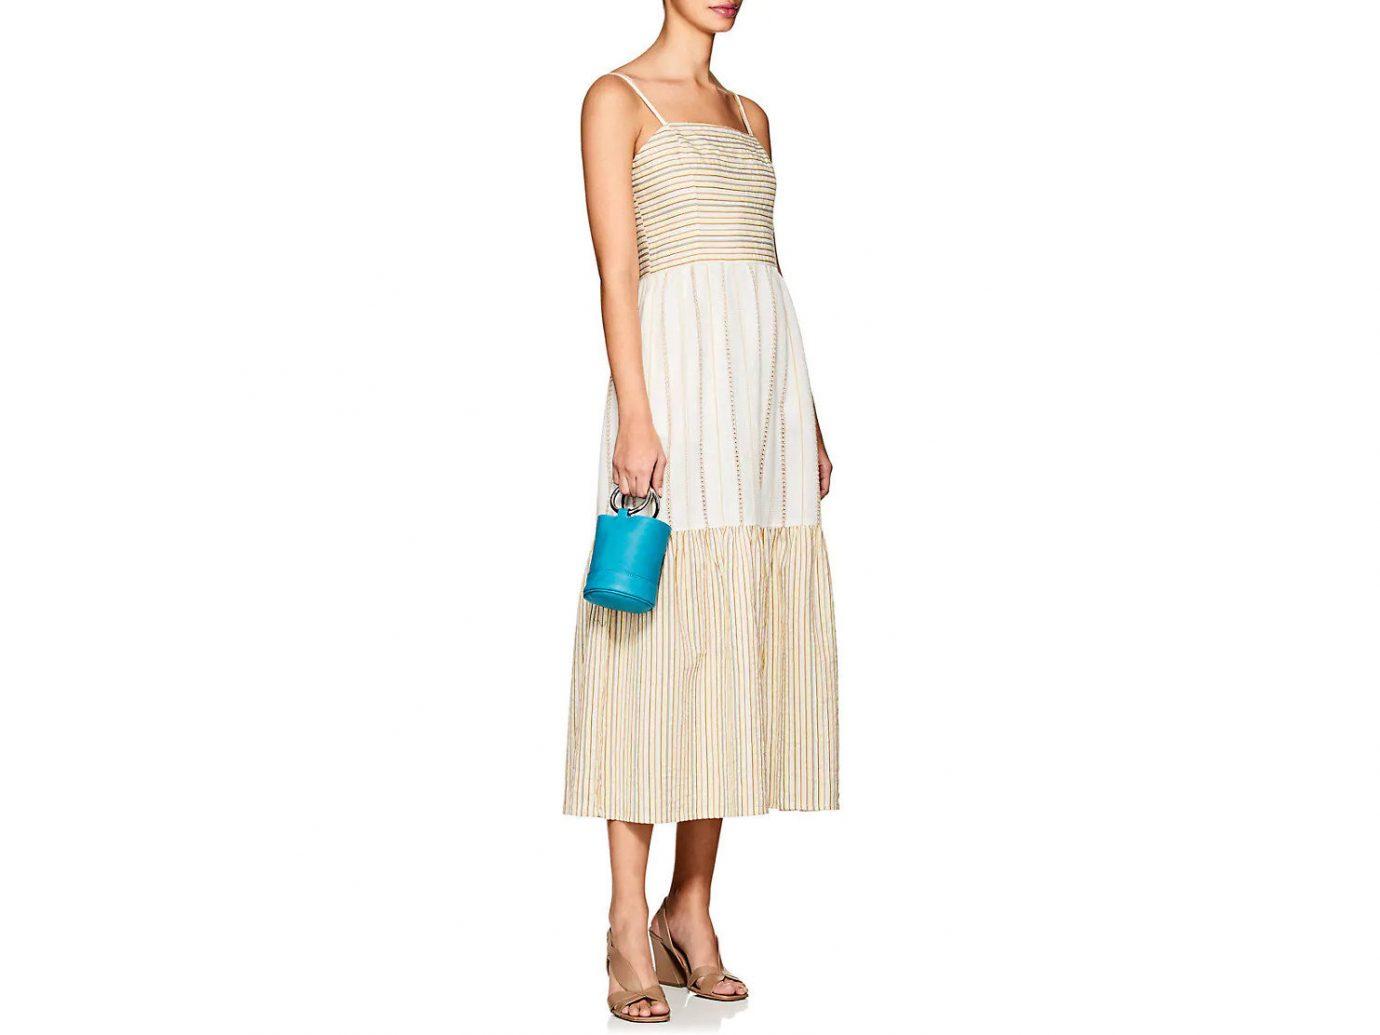 Style + Design Travel Shop day dress clothing dress shoulder fashion model skirt joint cocktail dress gown neck fashion design bridal party dress pattern